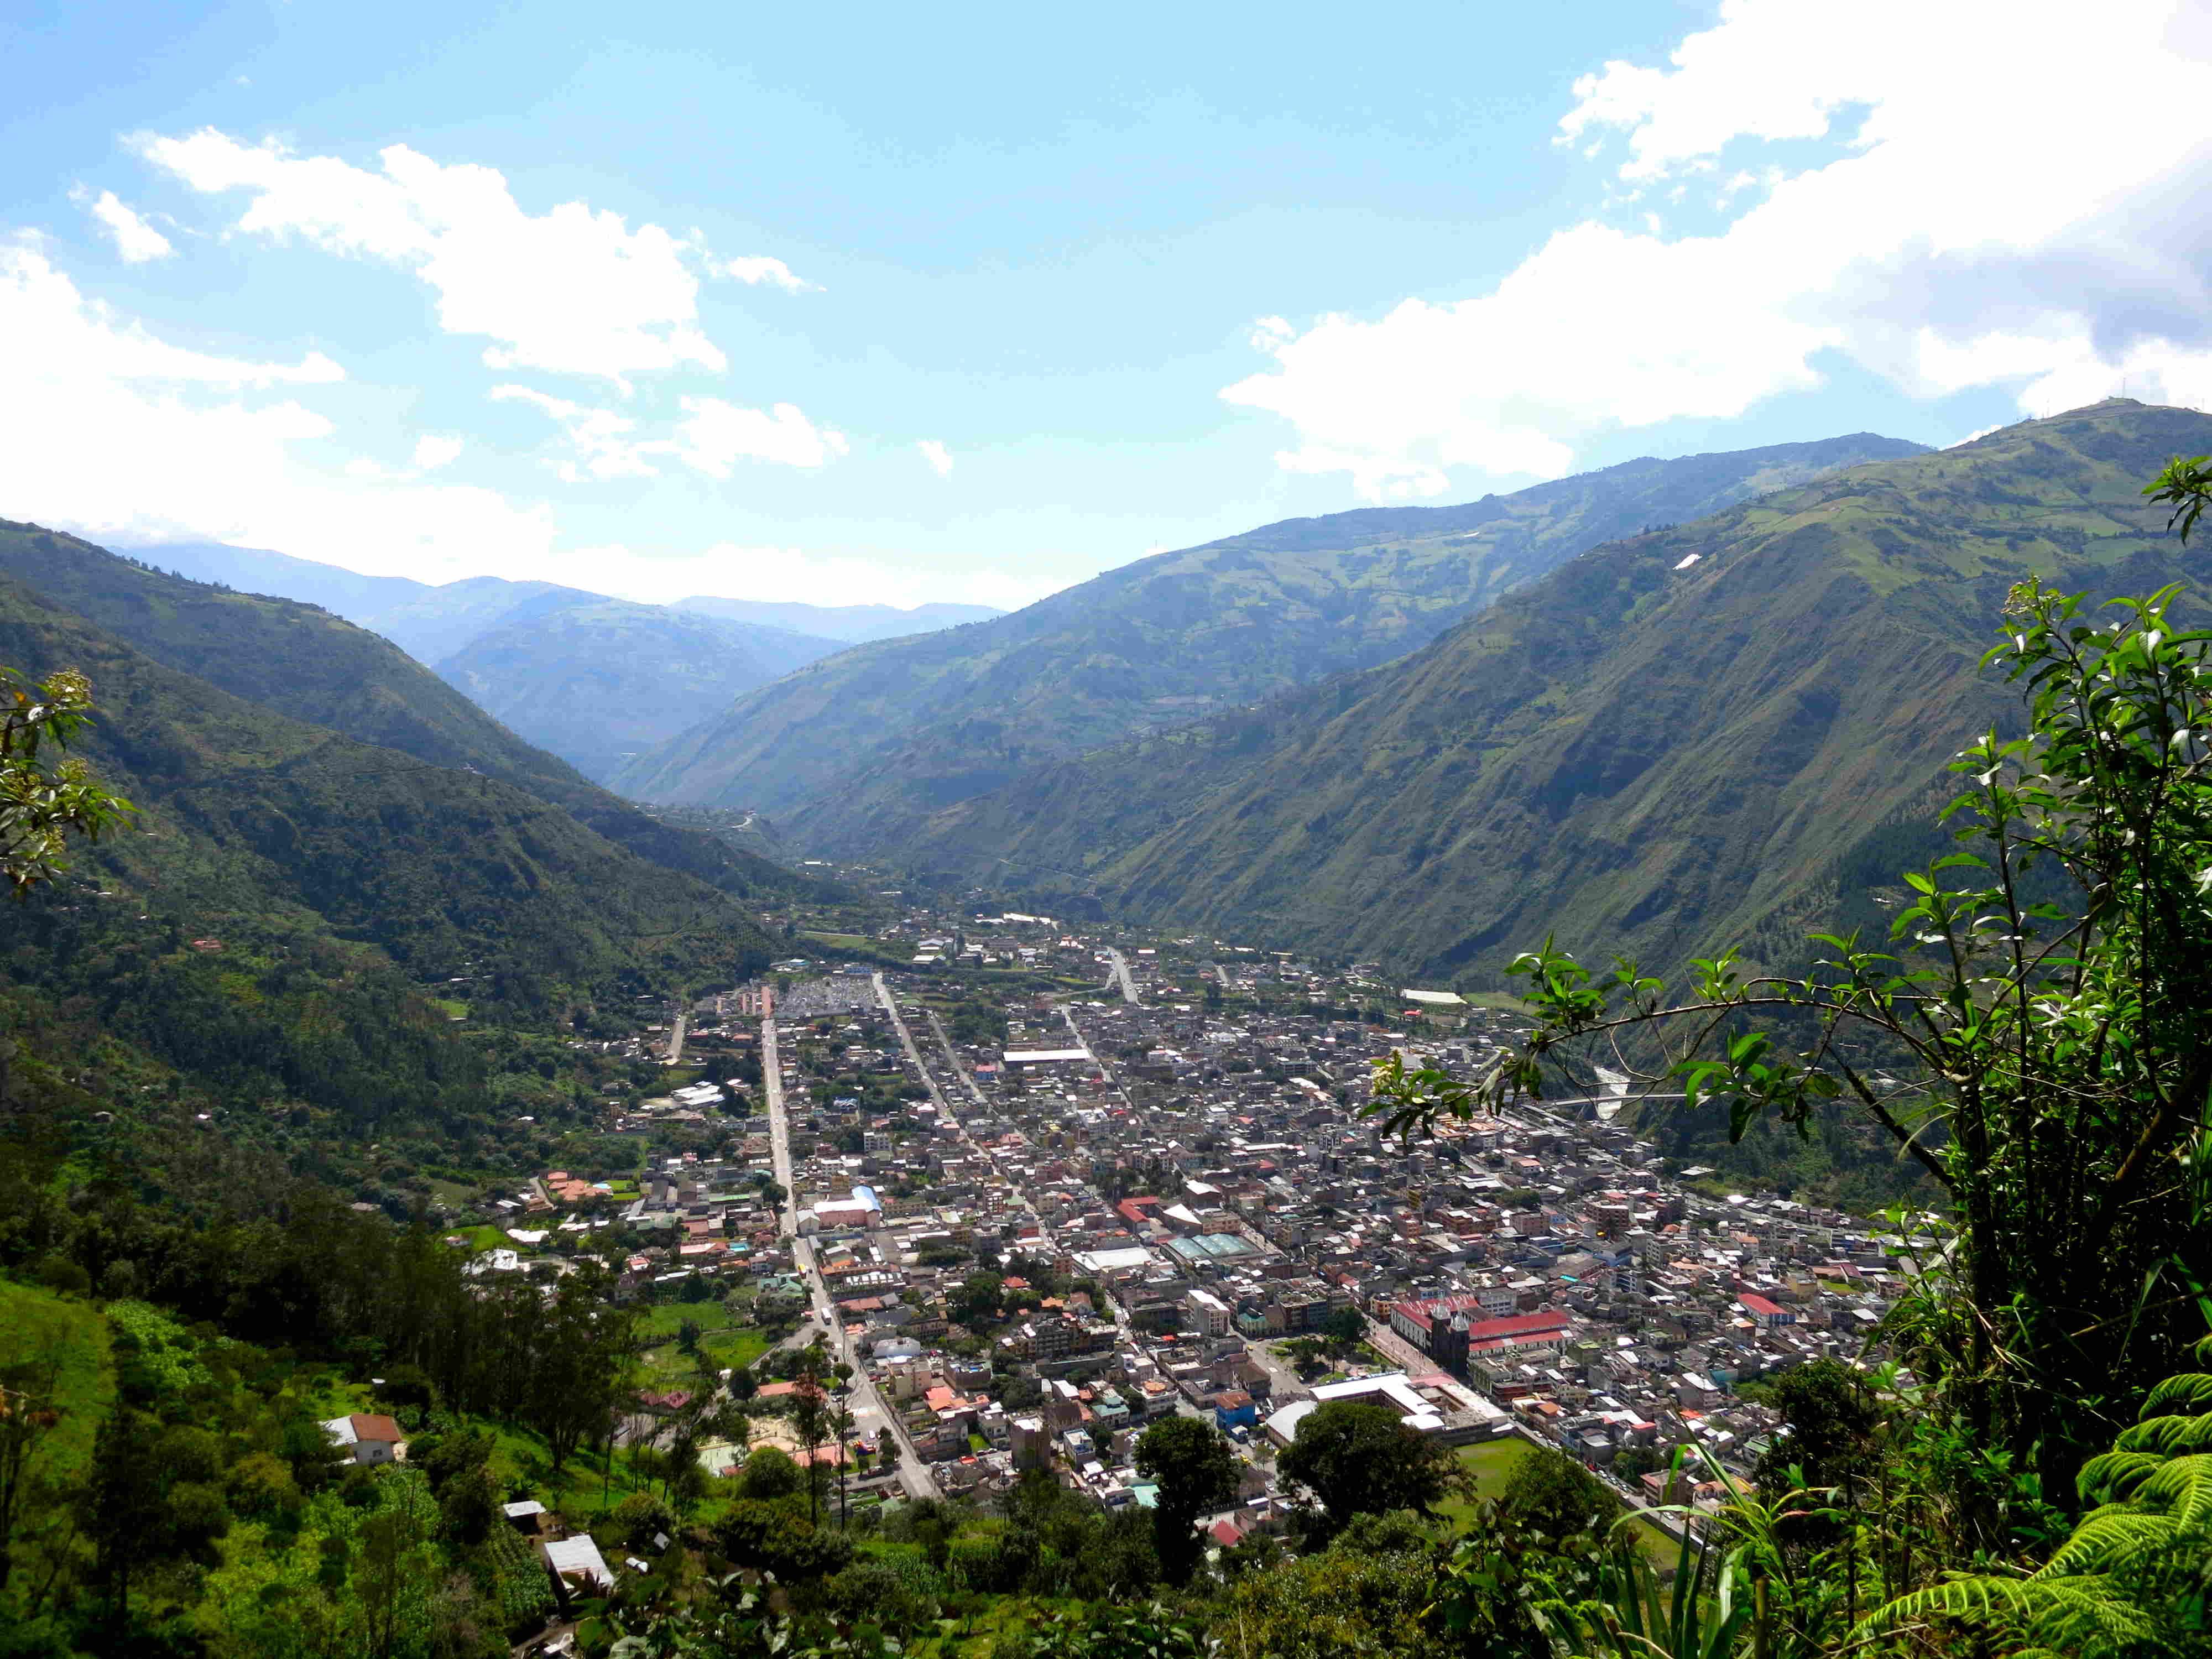 Panorama-Blick auf Baños (Foto: Elisabeth Vollinger)